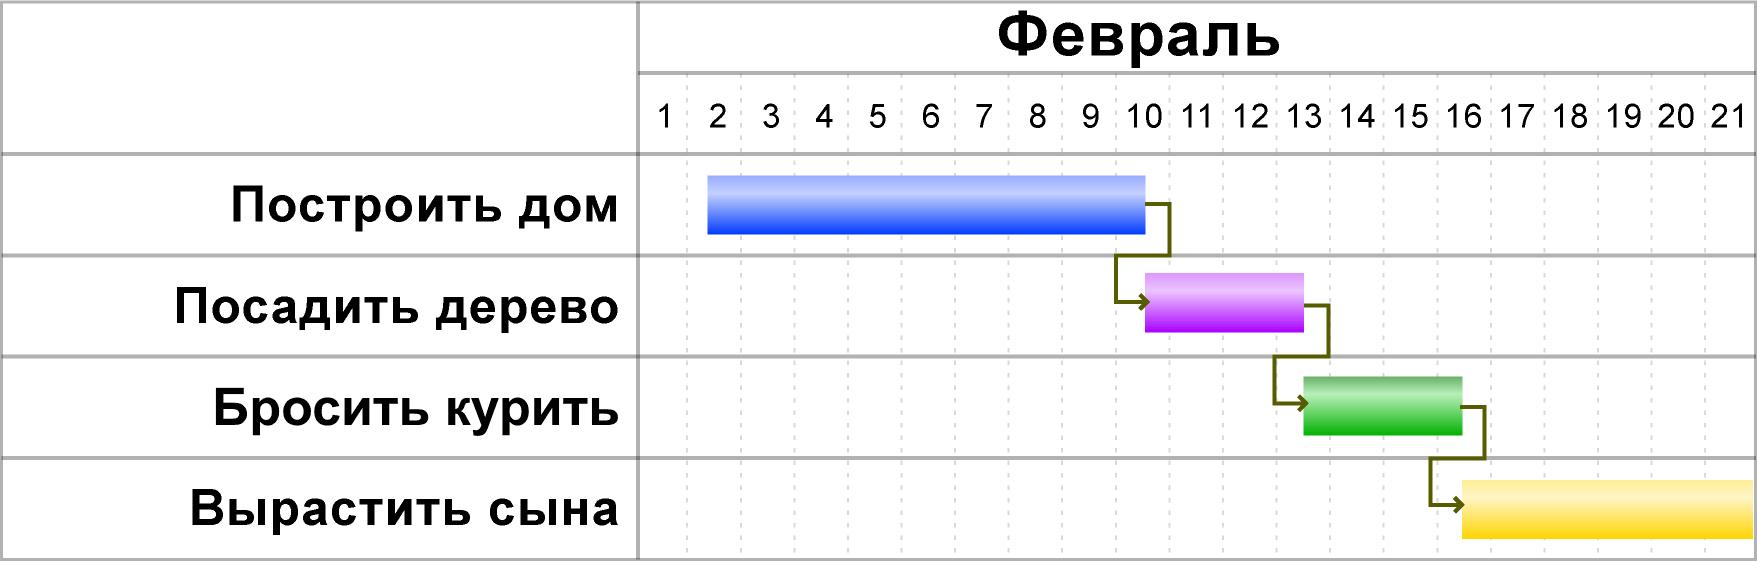 Gantt_diagram2.png